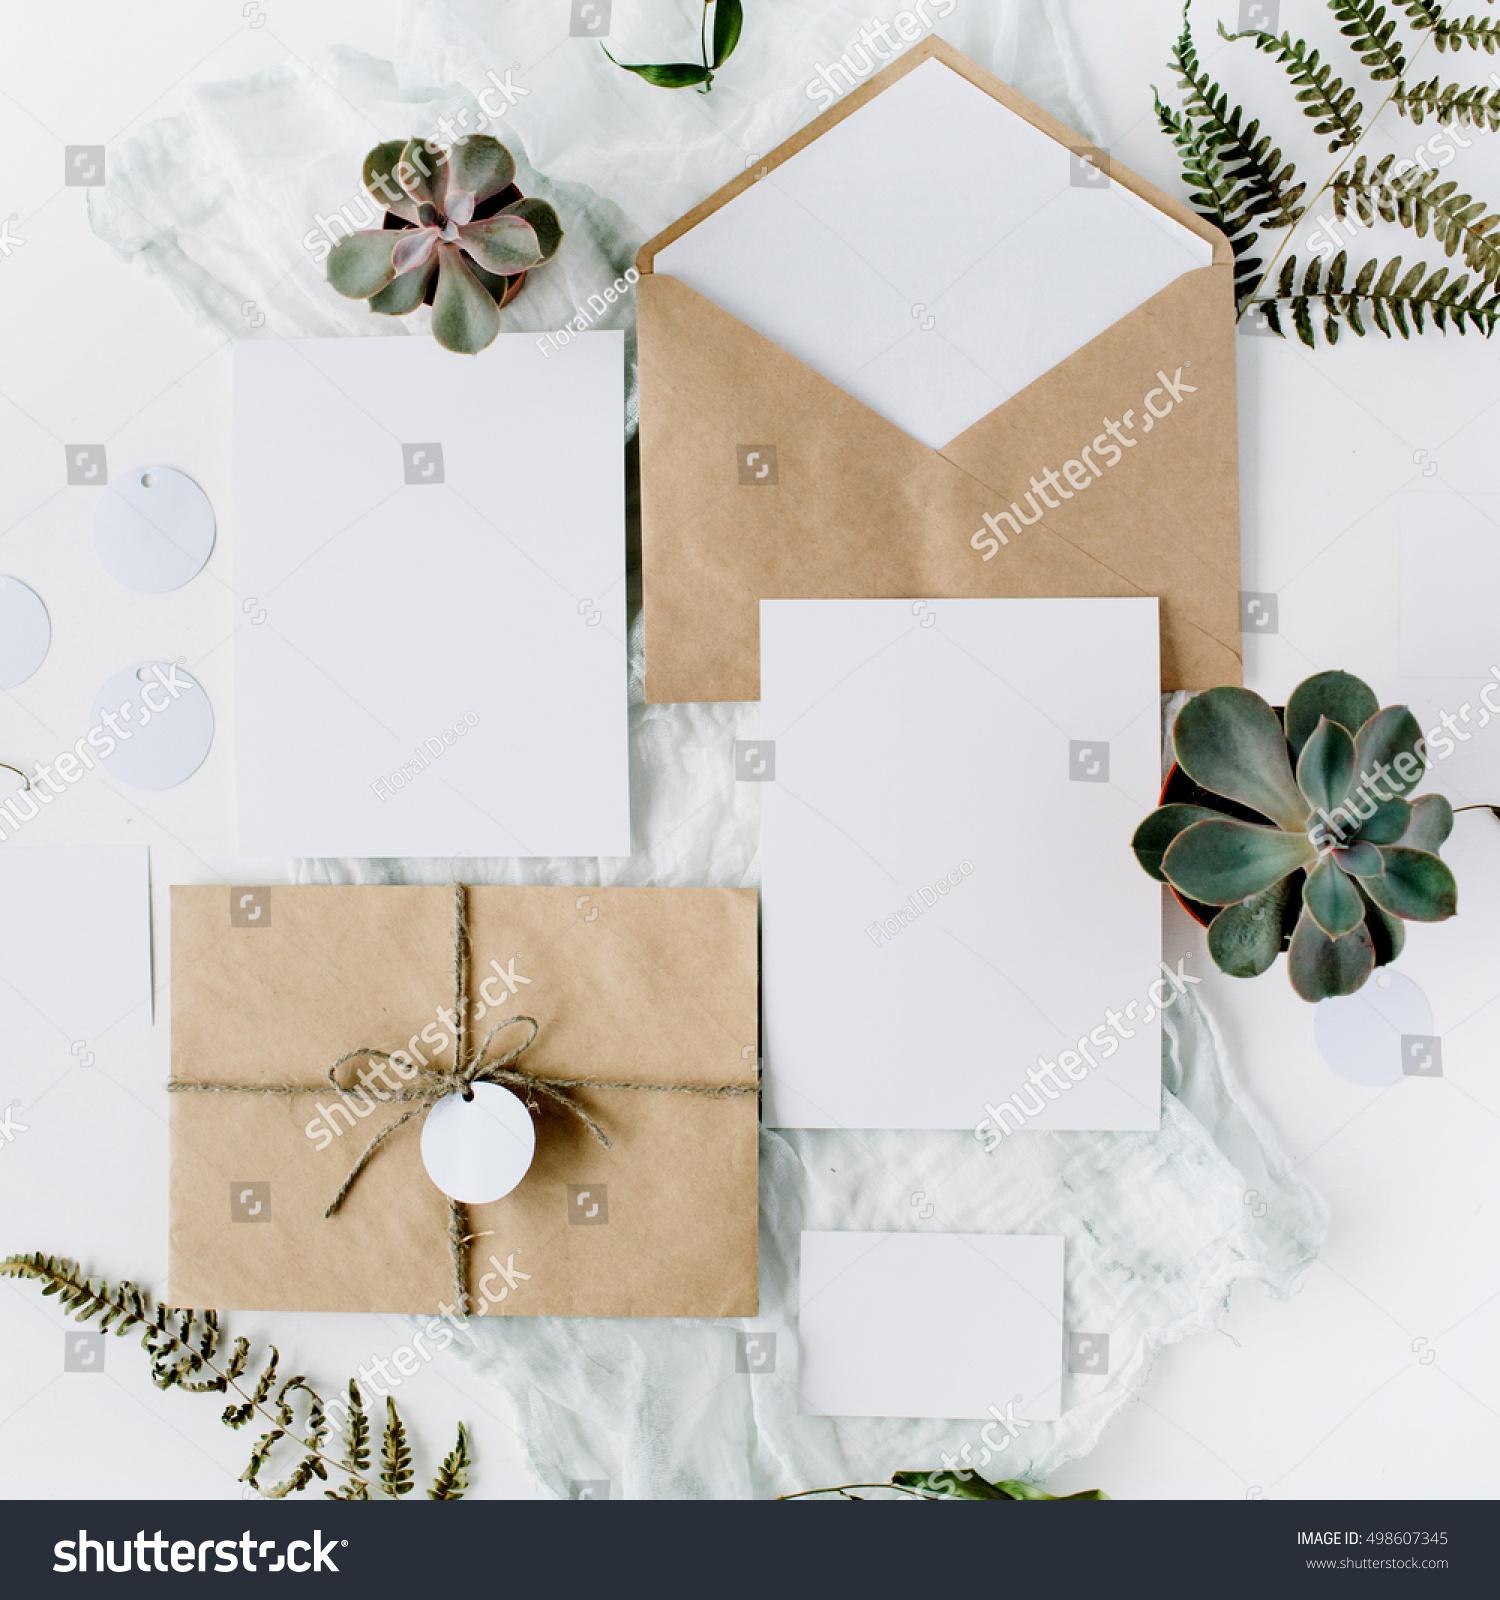 Flat Lay Workspace Wedding Invitation Cards Stock Photo (Royalty ...